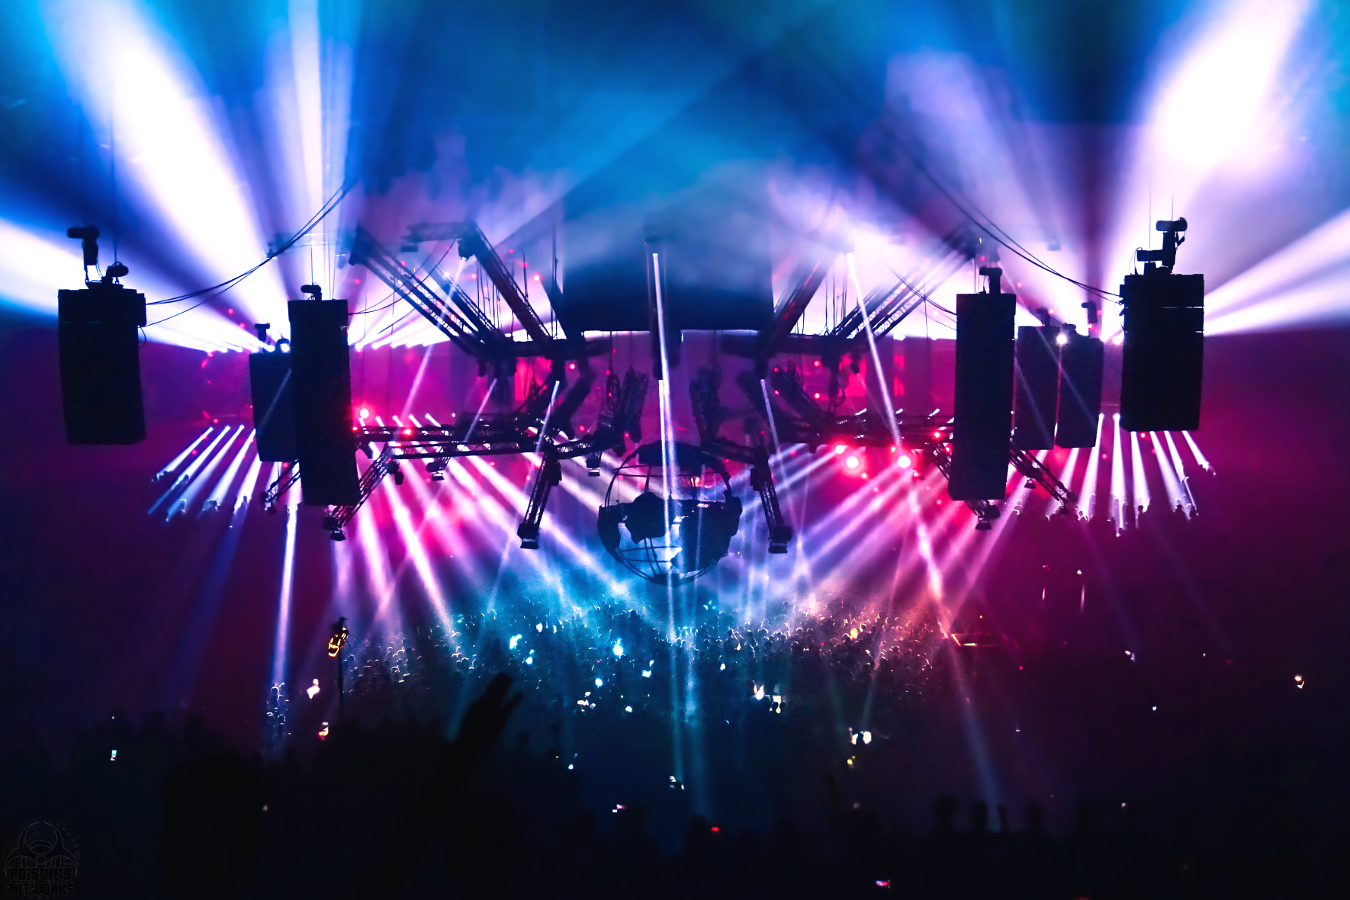 REVERZE - 7 Mars 2020 - Sportpaleis/Lotto Arena - Anvers - BE DSC04574rcSW